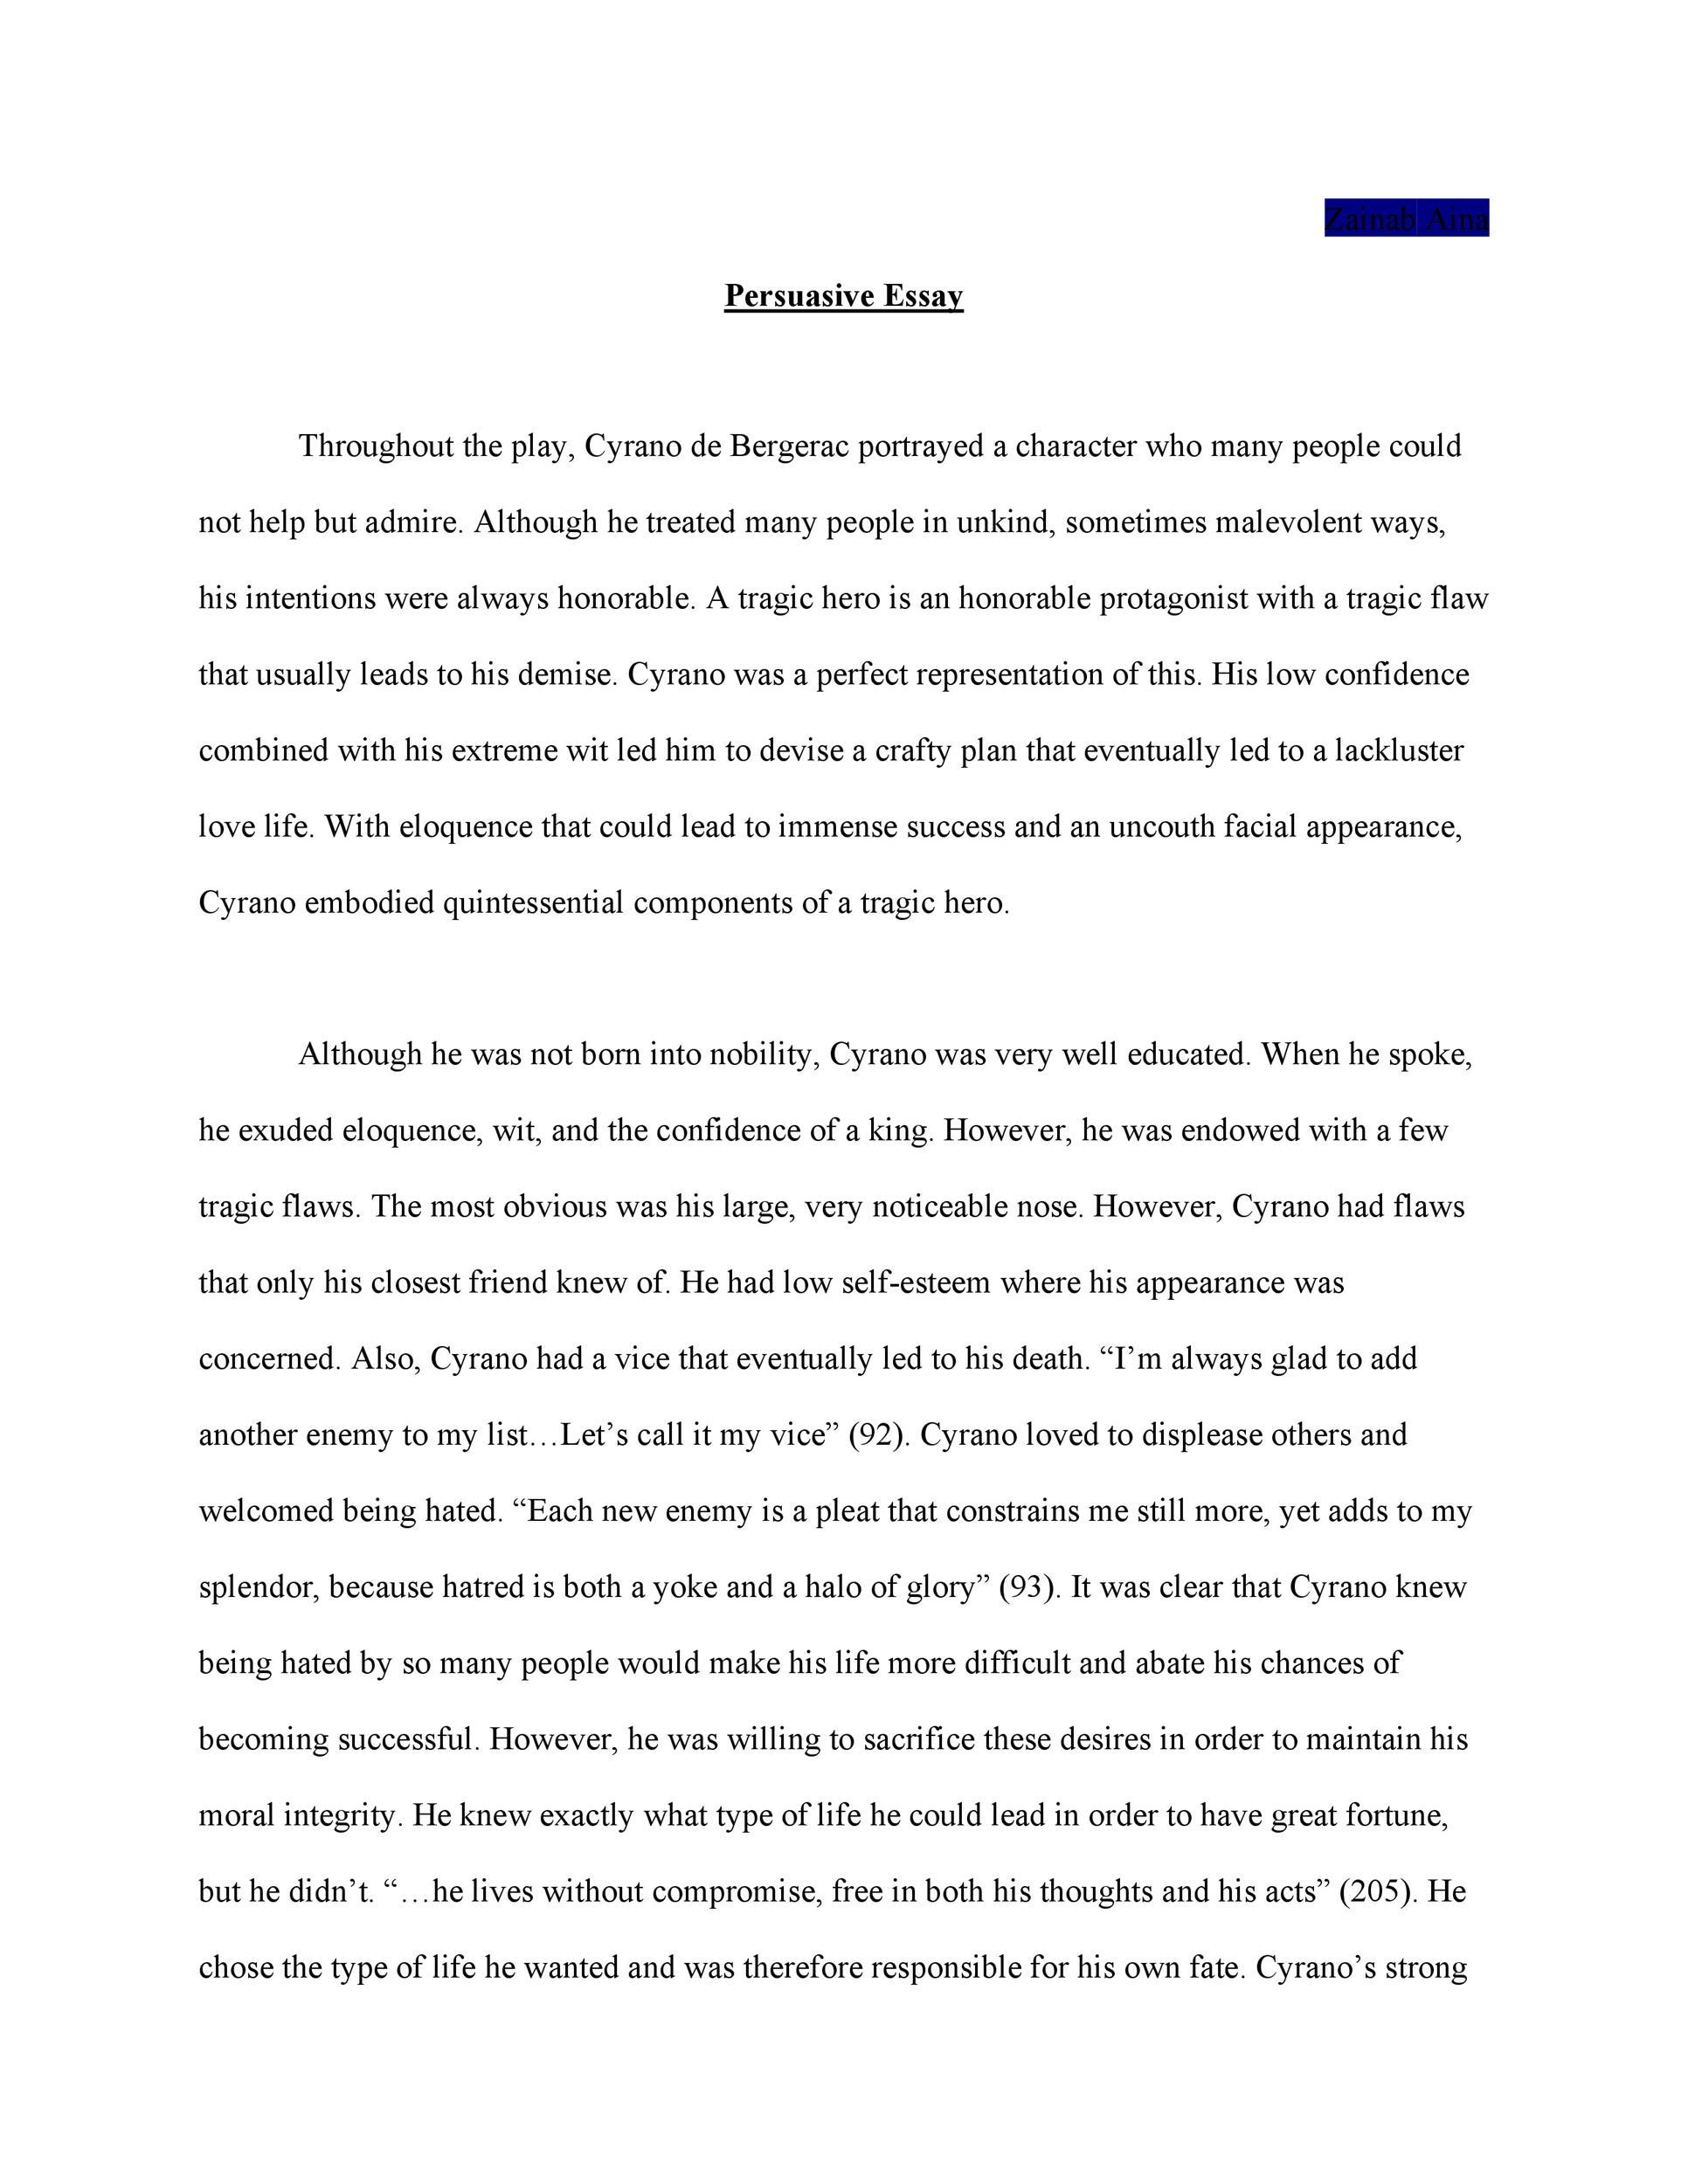 Free persuasive essay example 18